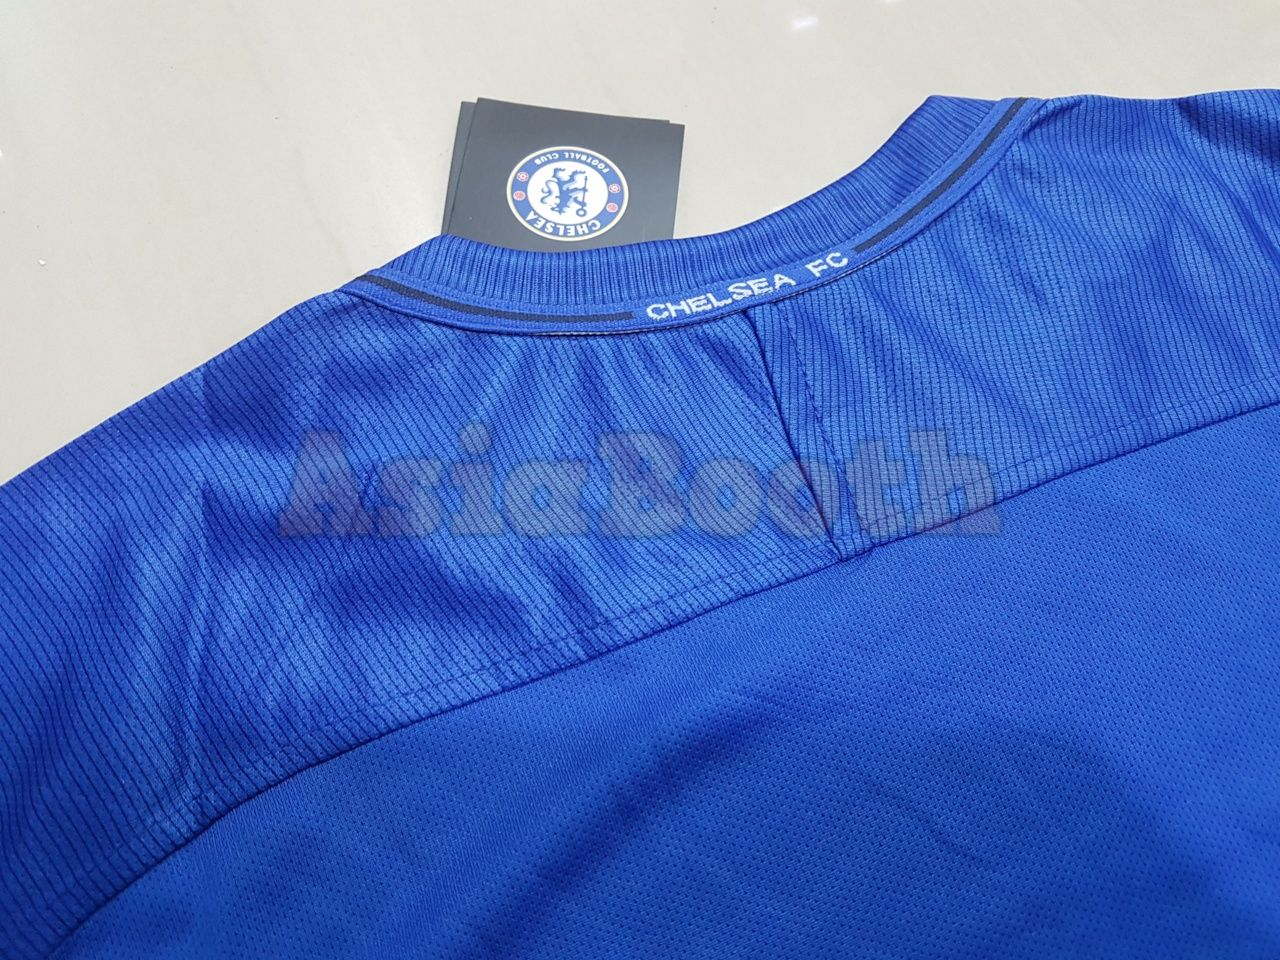 d9a525f87b0 2017-2018 Chelsea FC Home Jersey Shirt For Men Dri-FIT (Eden Hazard ...